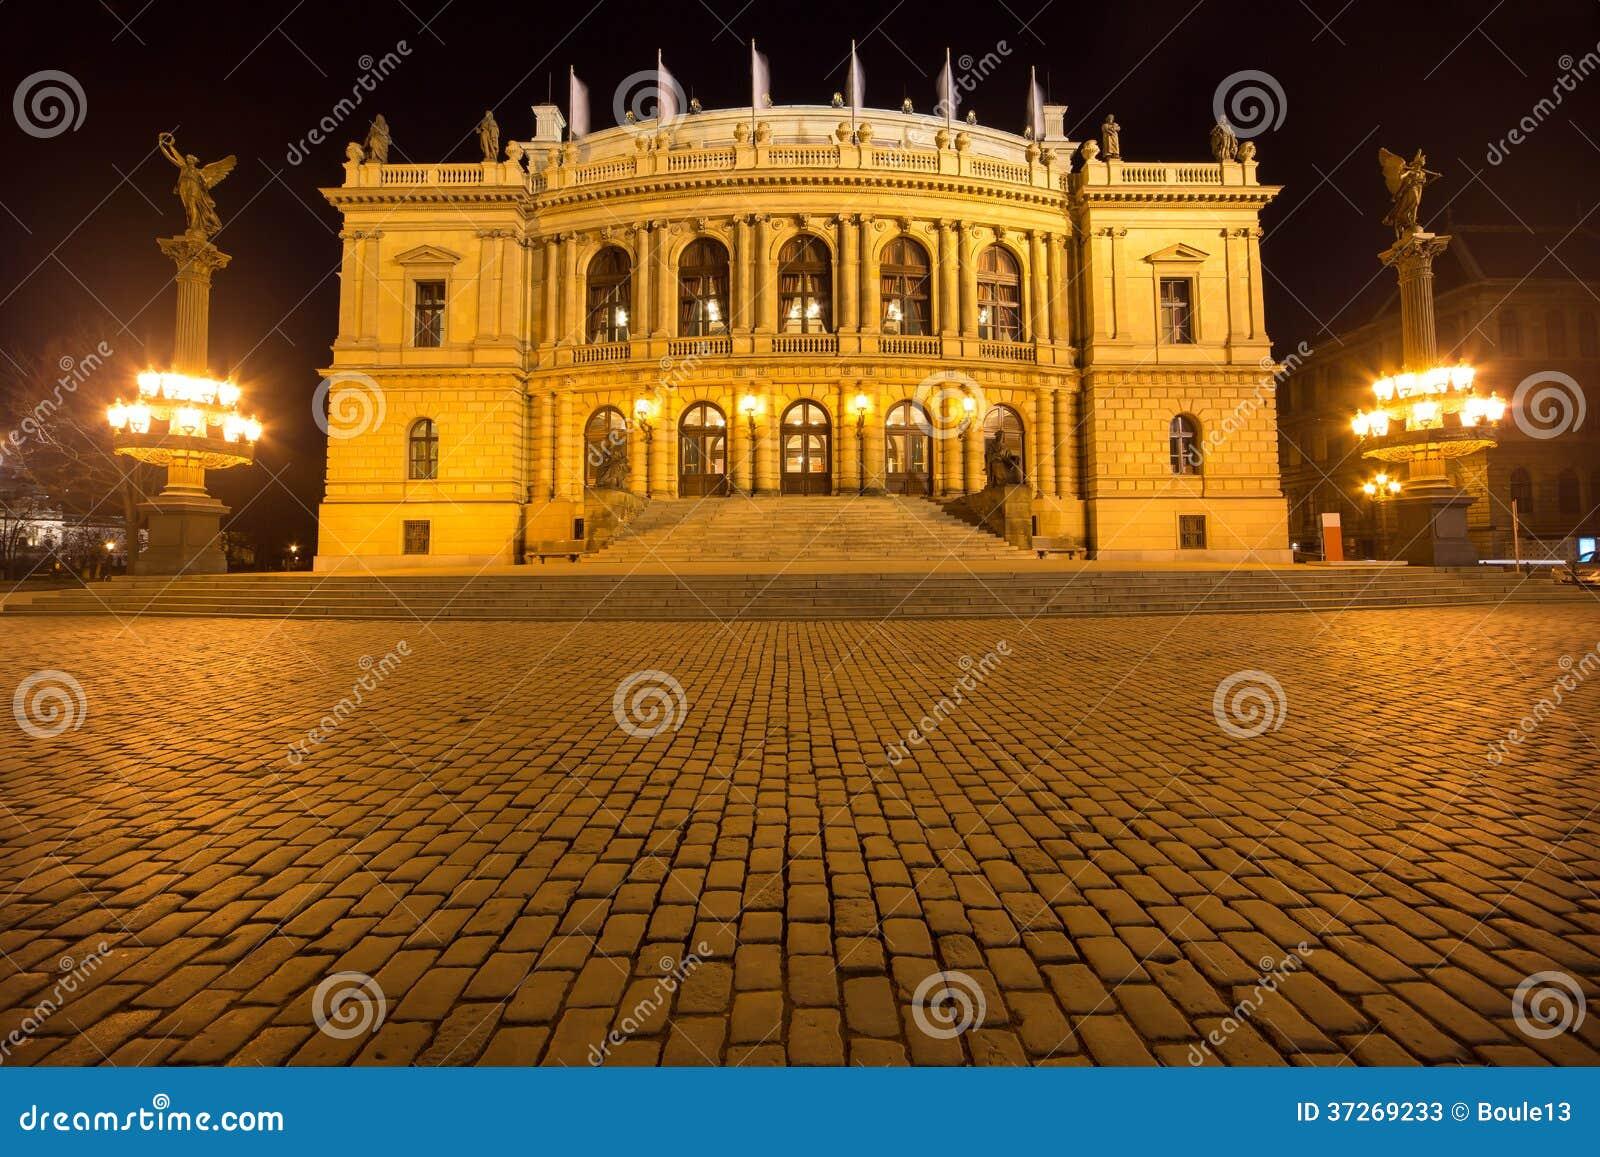 Krajowy teatr w Praga